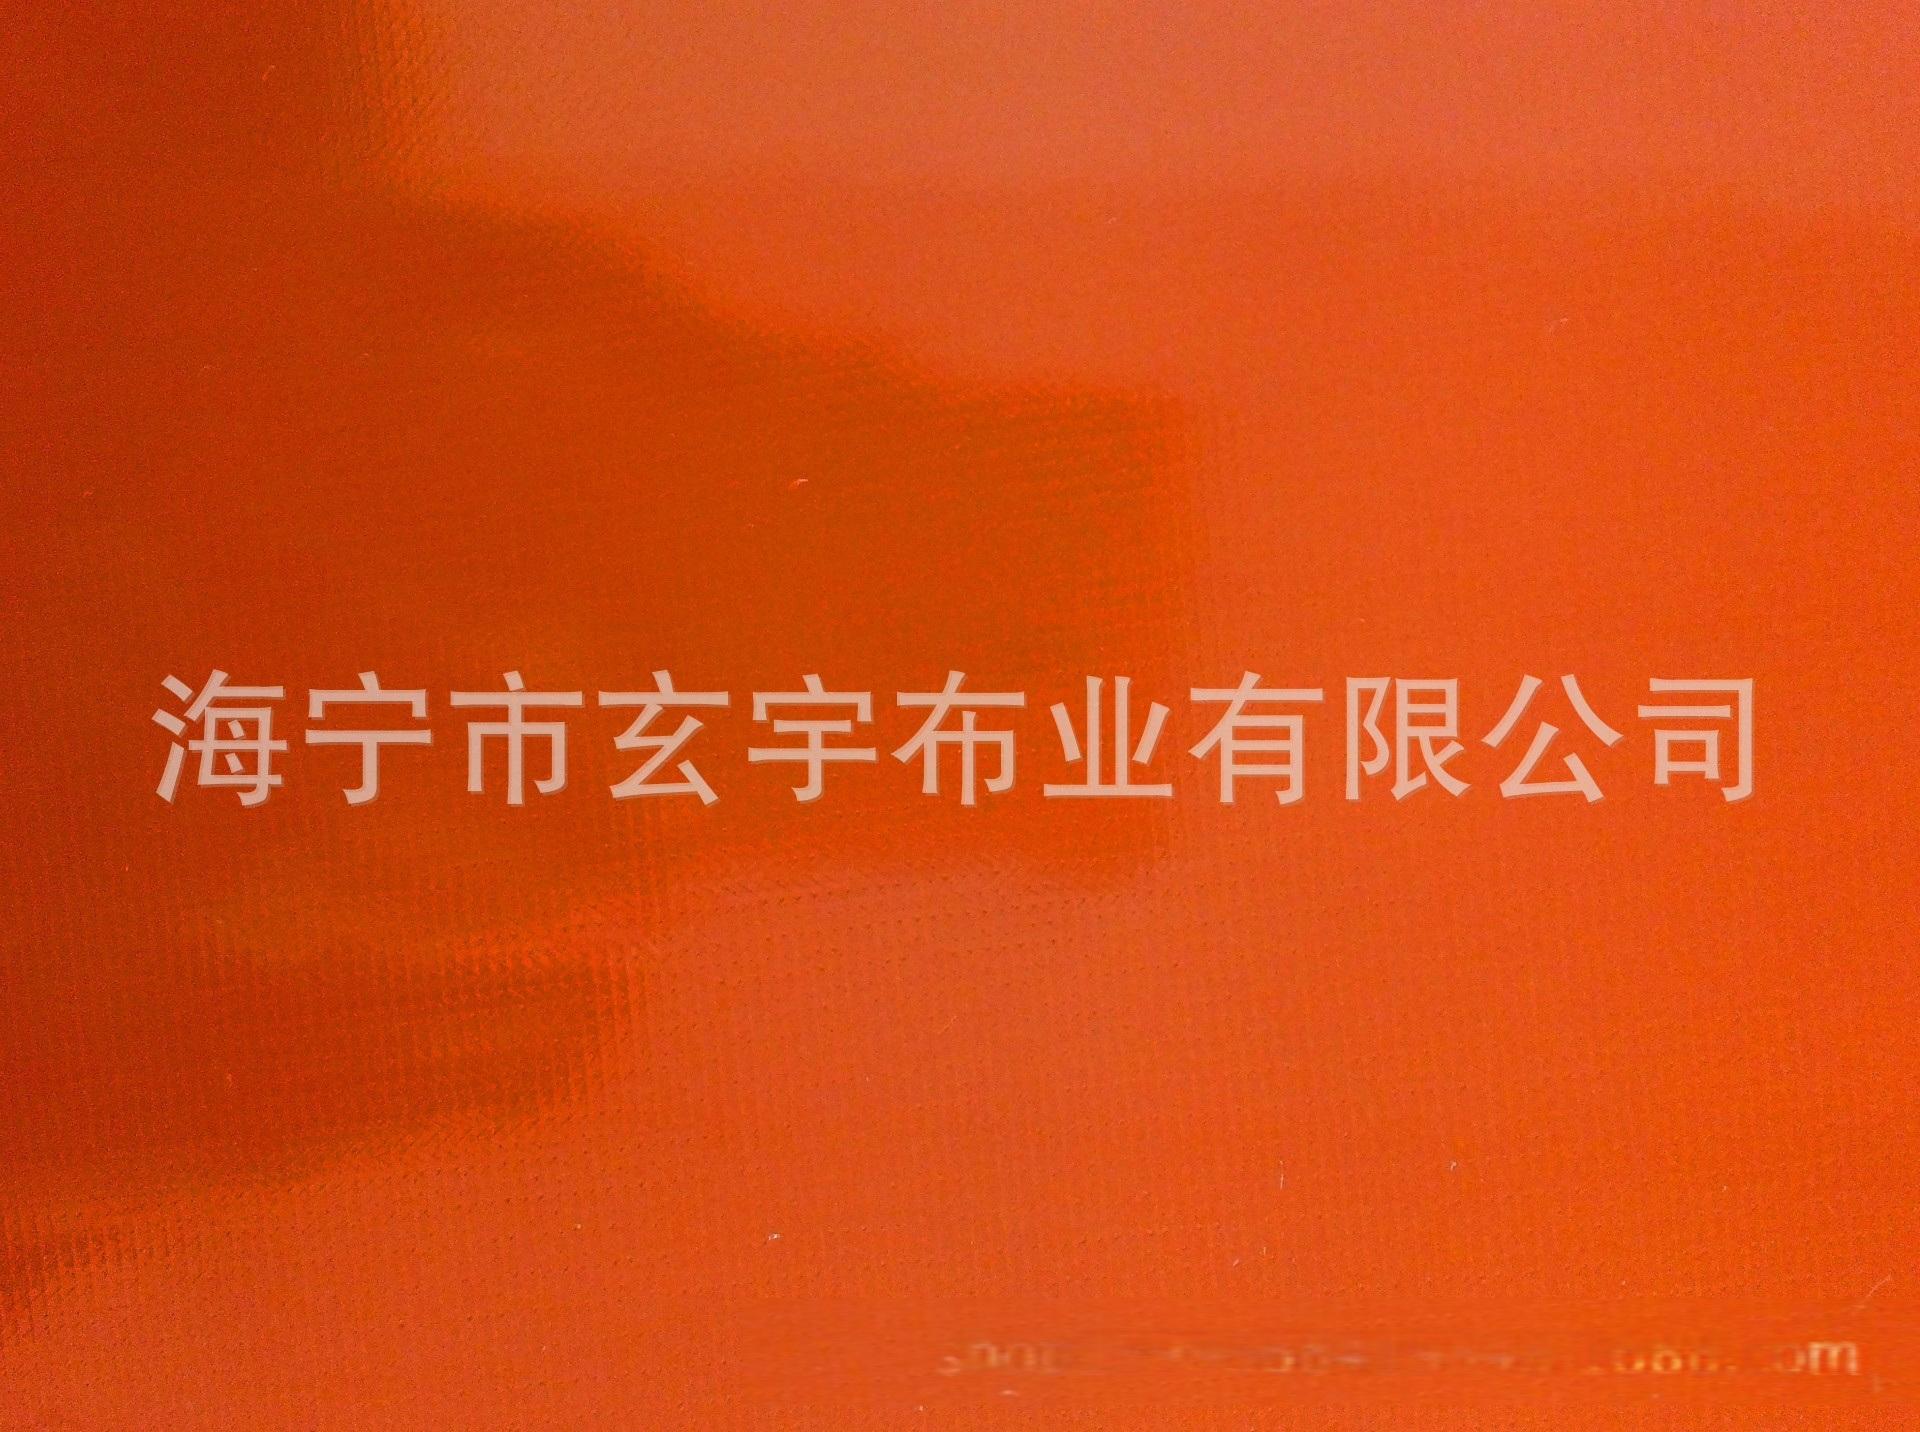 IMG_20141014_124221_副本_副本